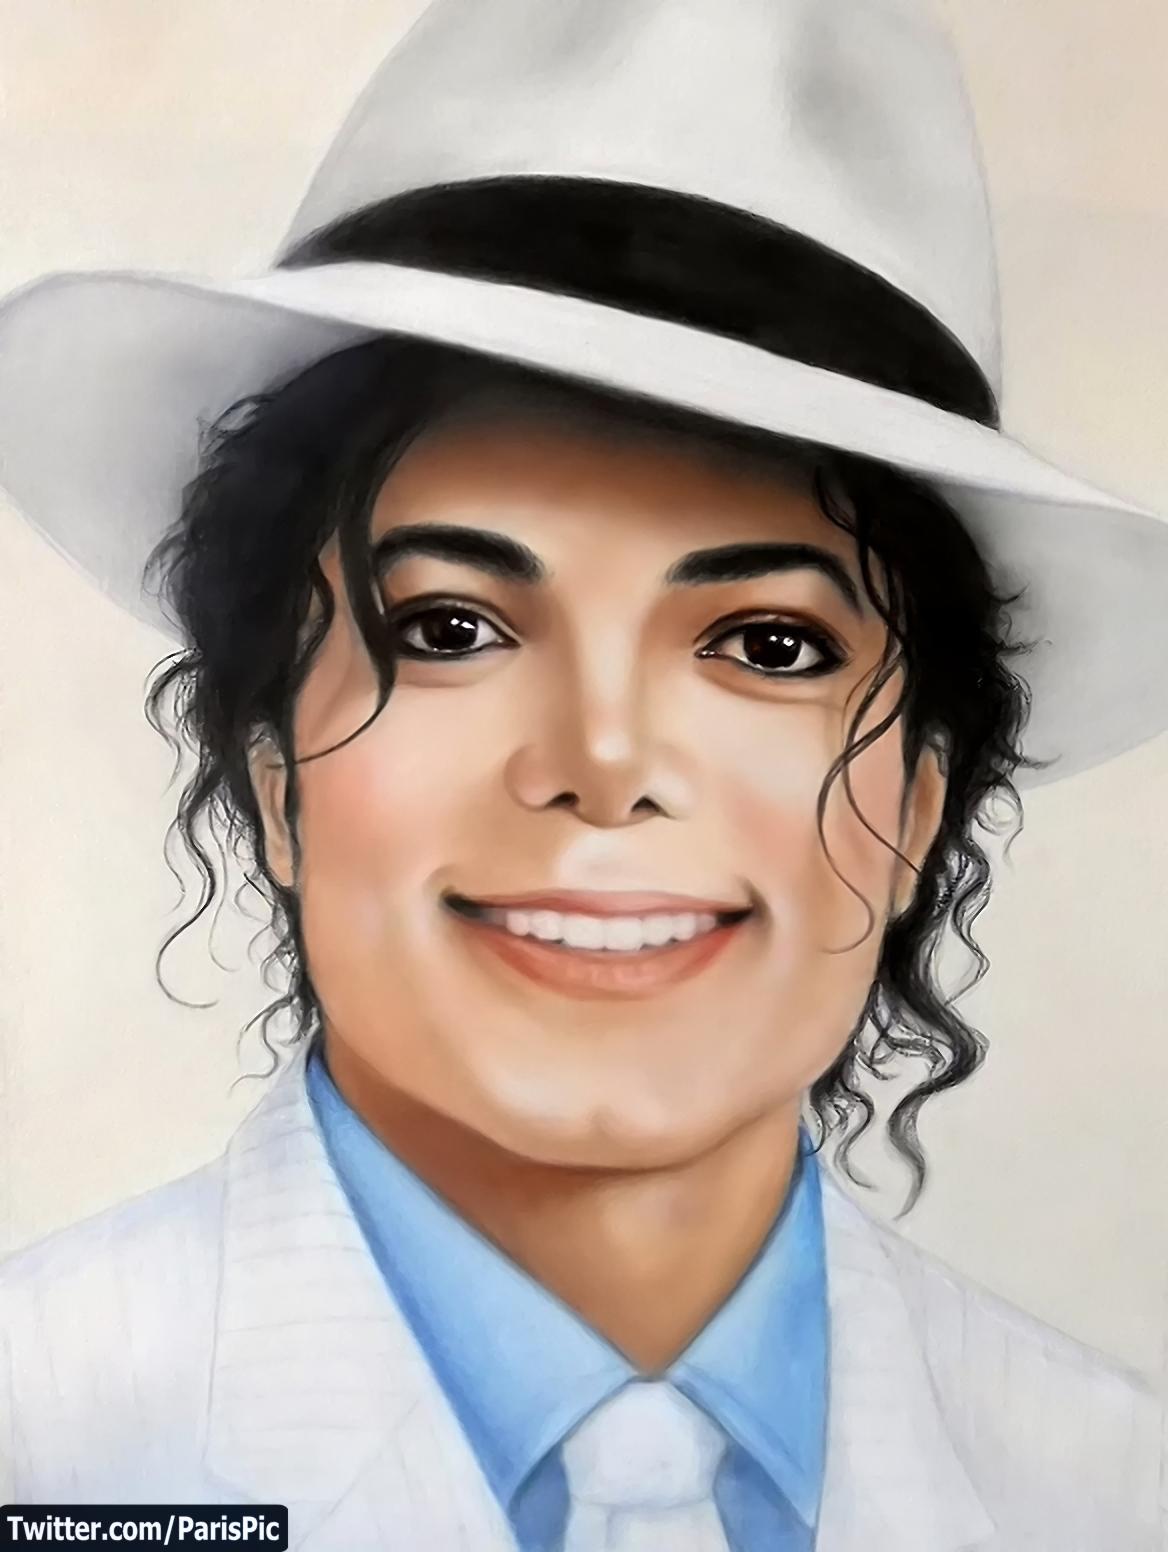 Michael Jackson Birthday Moonwalk Thriller Kids (@ParisPic)